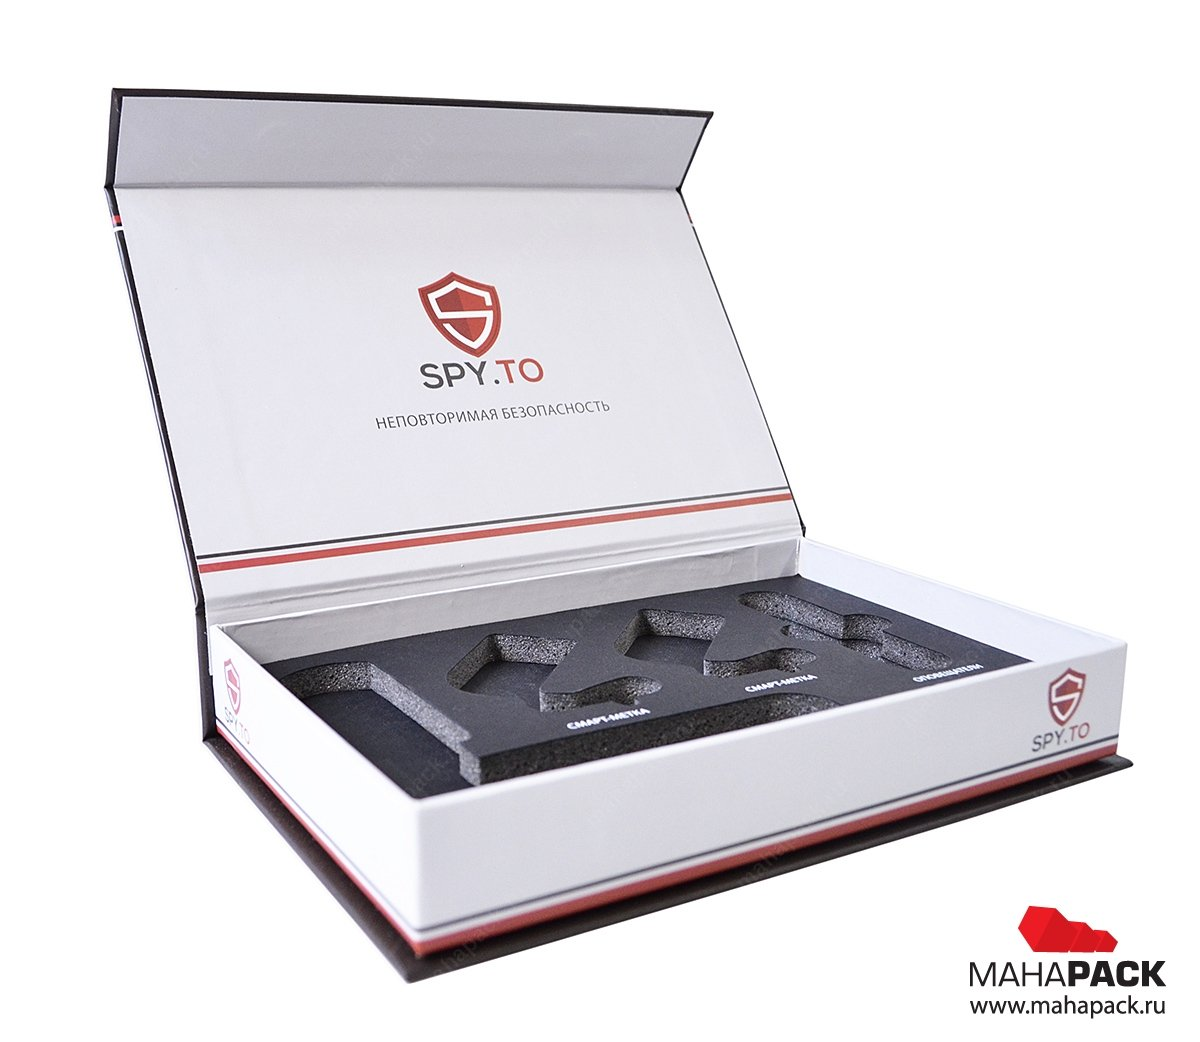 Коробка с клапаном на магните